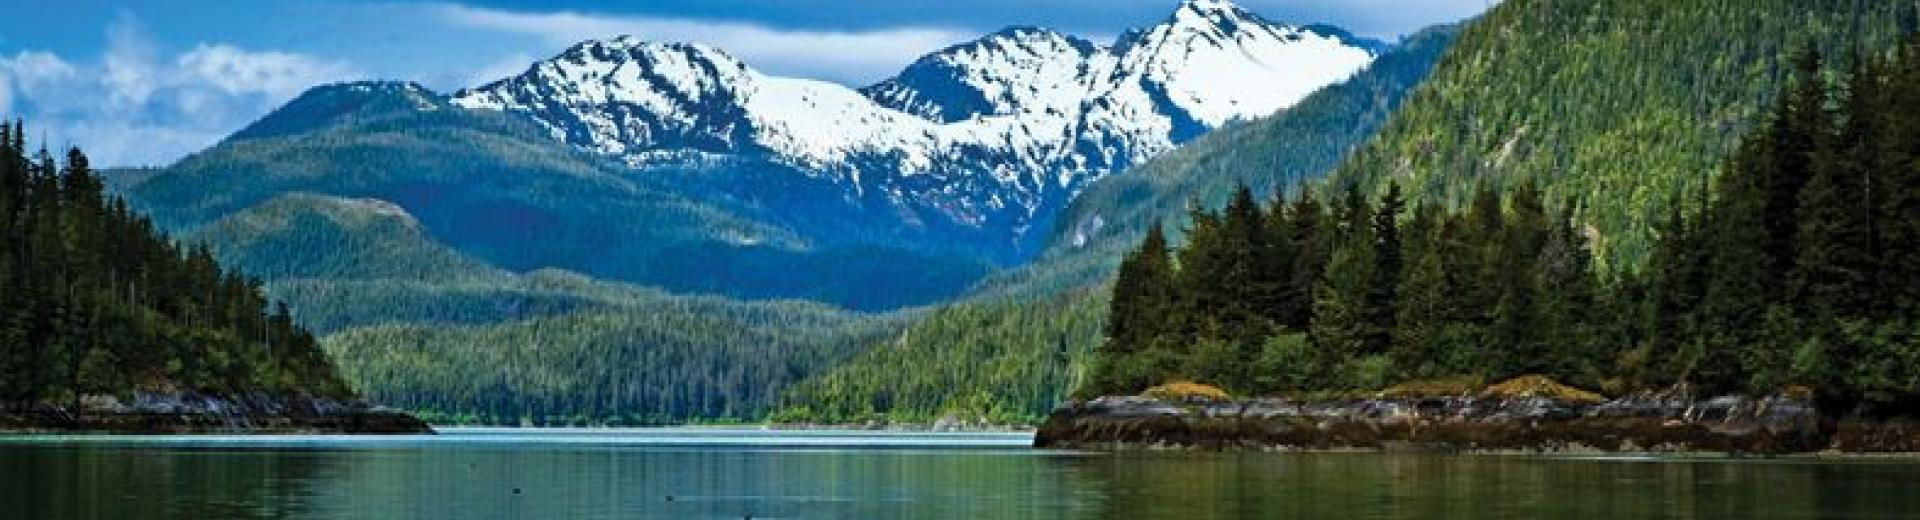 Thomas Bay Alaska